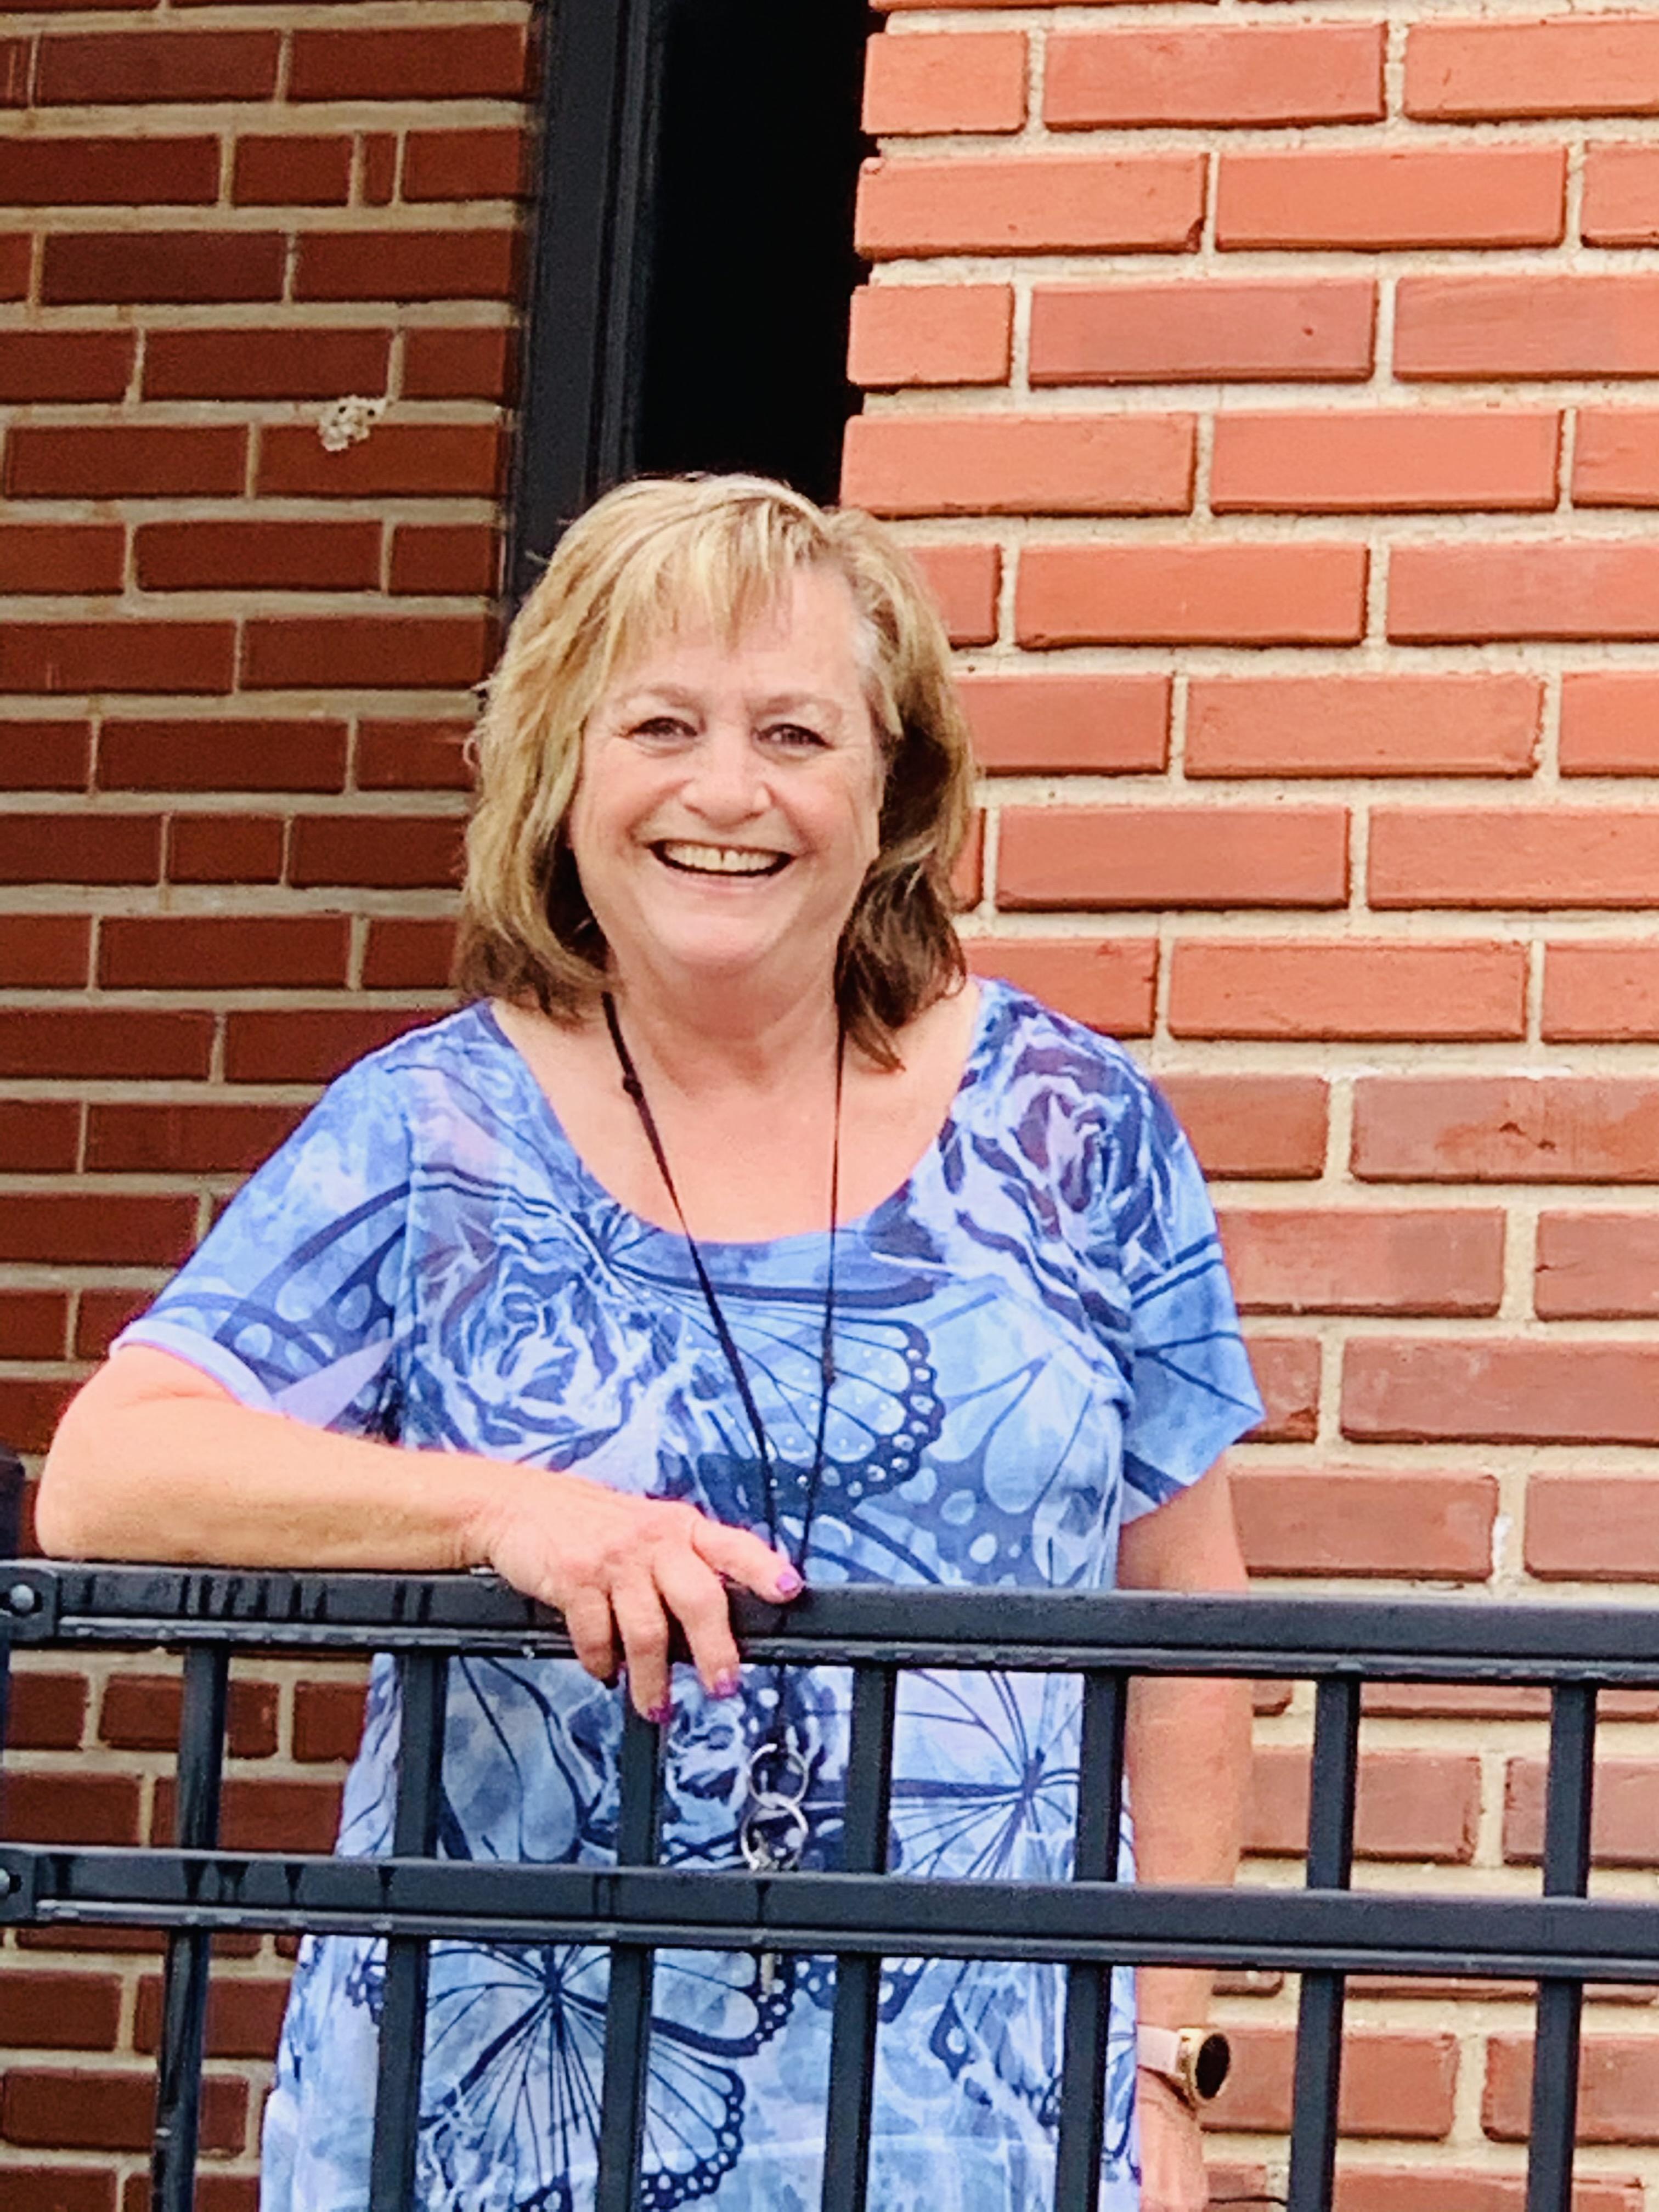 Debbie O'Neal- Garfield Health Assistant